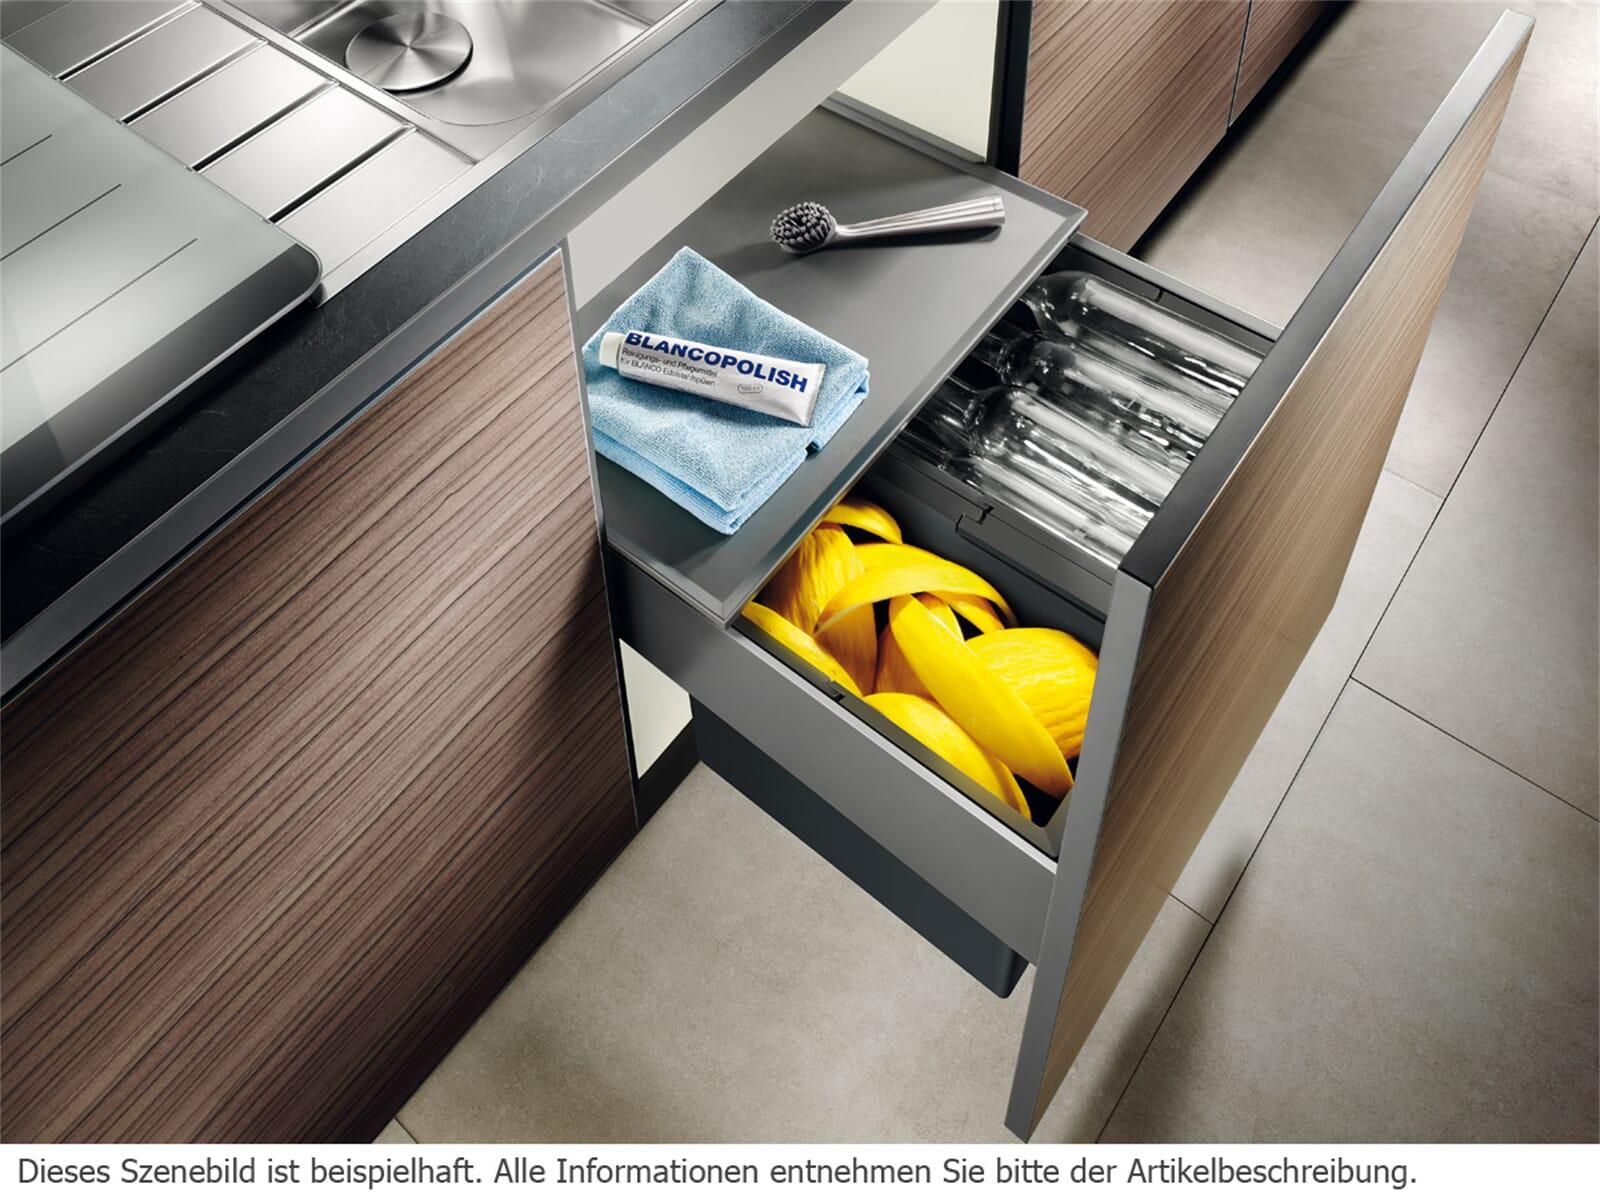 blanco select 60 3 einbau abfallsammler f r 134 90 eur. Black Bedroom Furniture Sets. Home Design Ideas